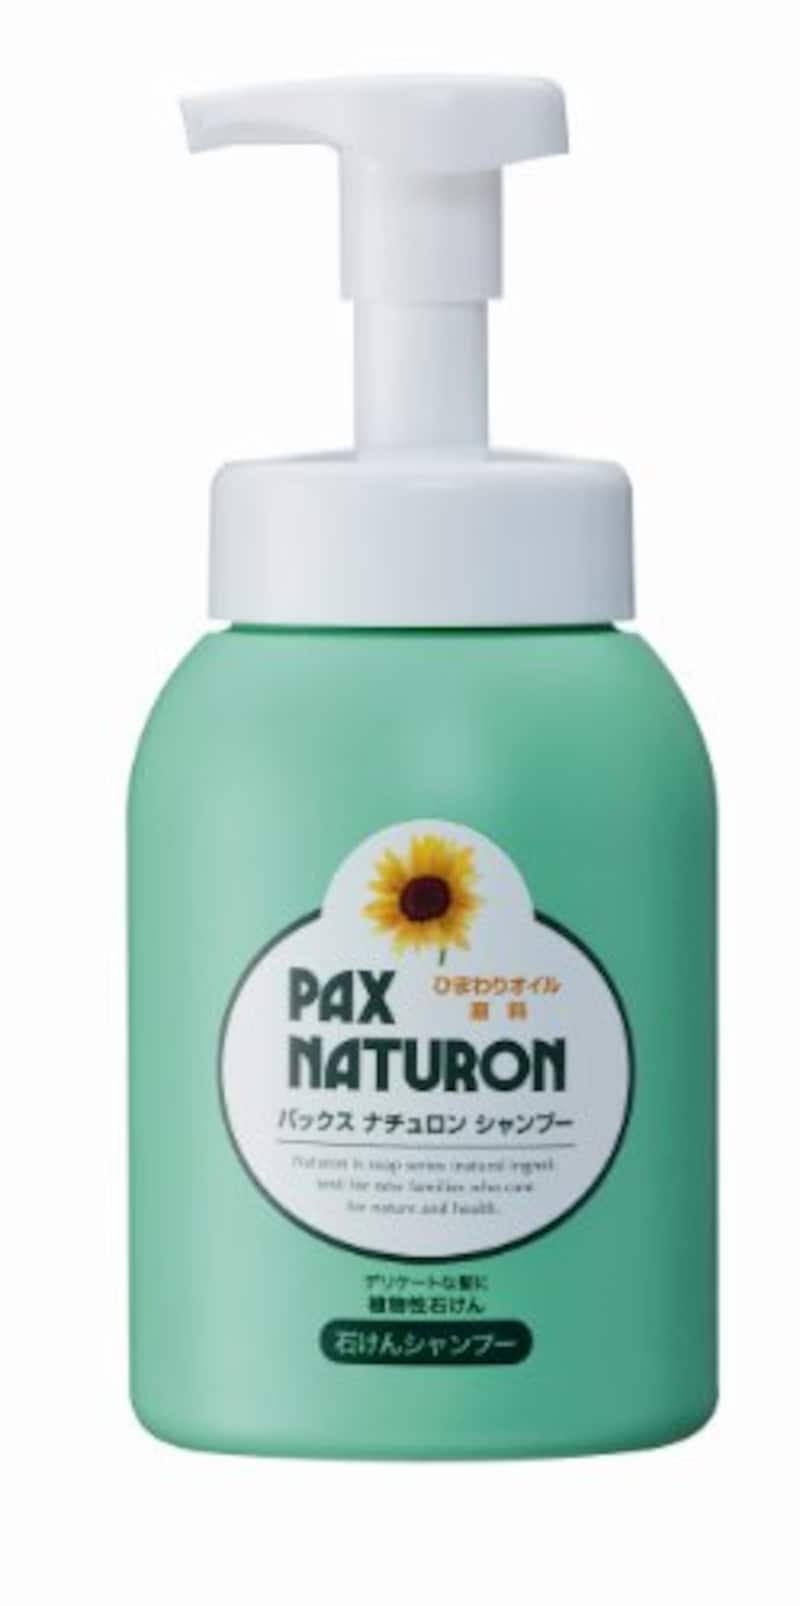 PAX NATURON(パックスナチュロン),泡ポンプ式 シャンプー